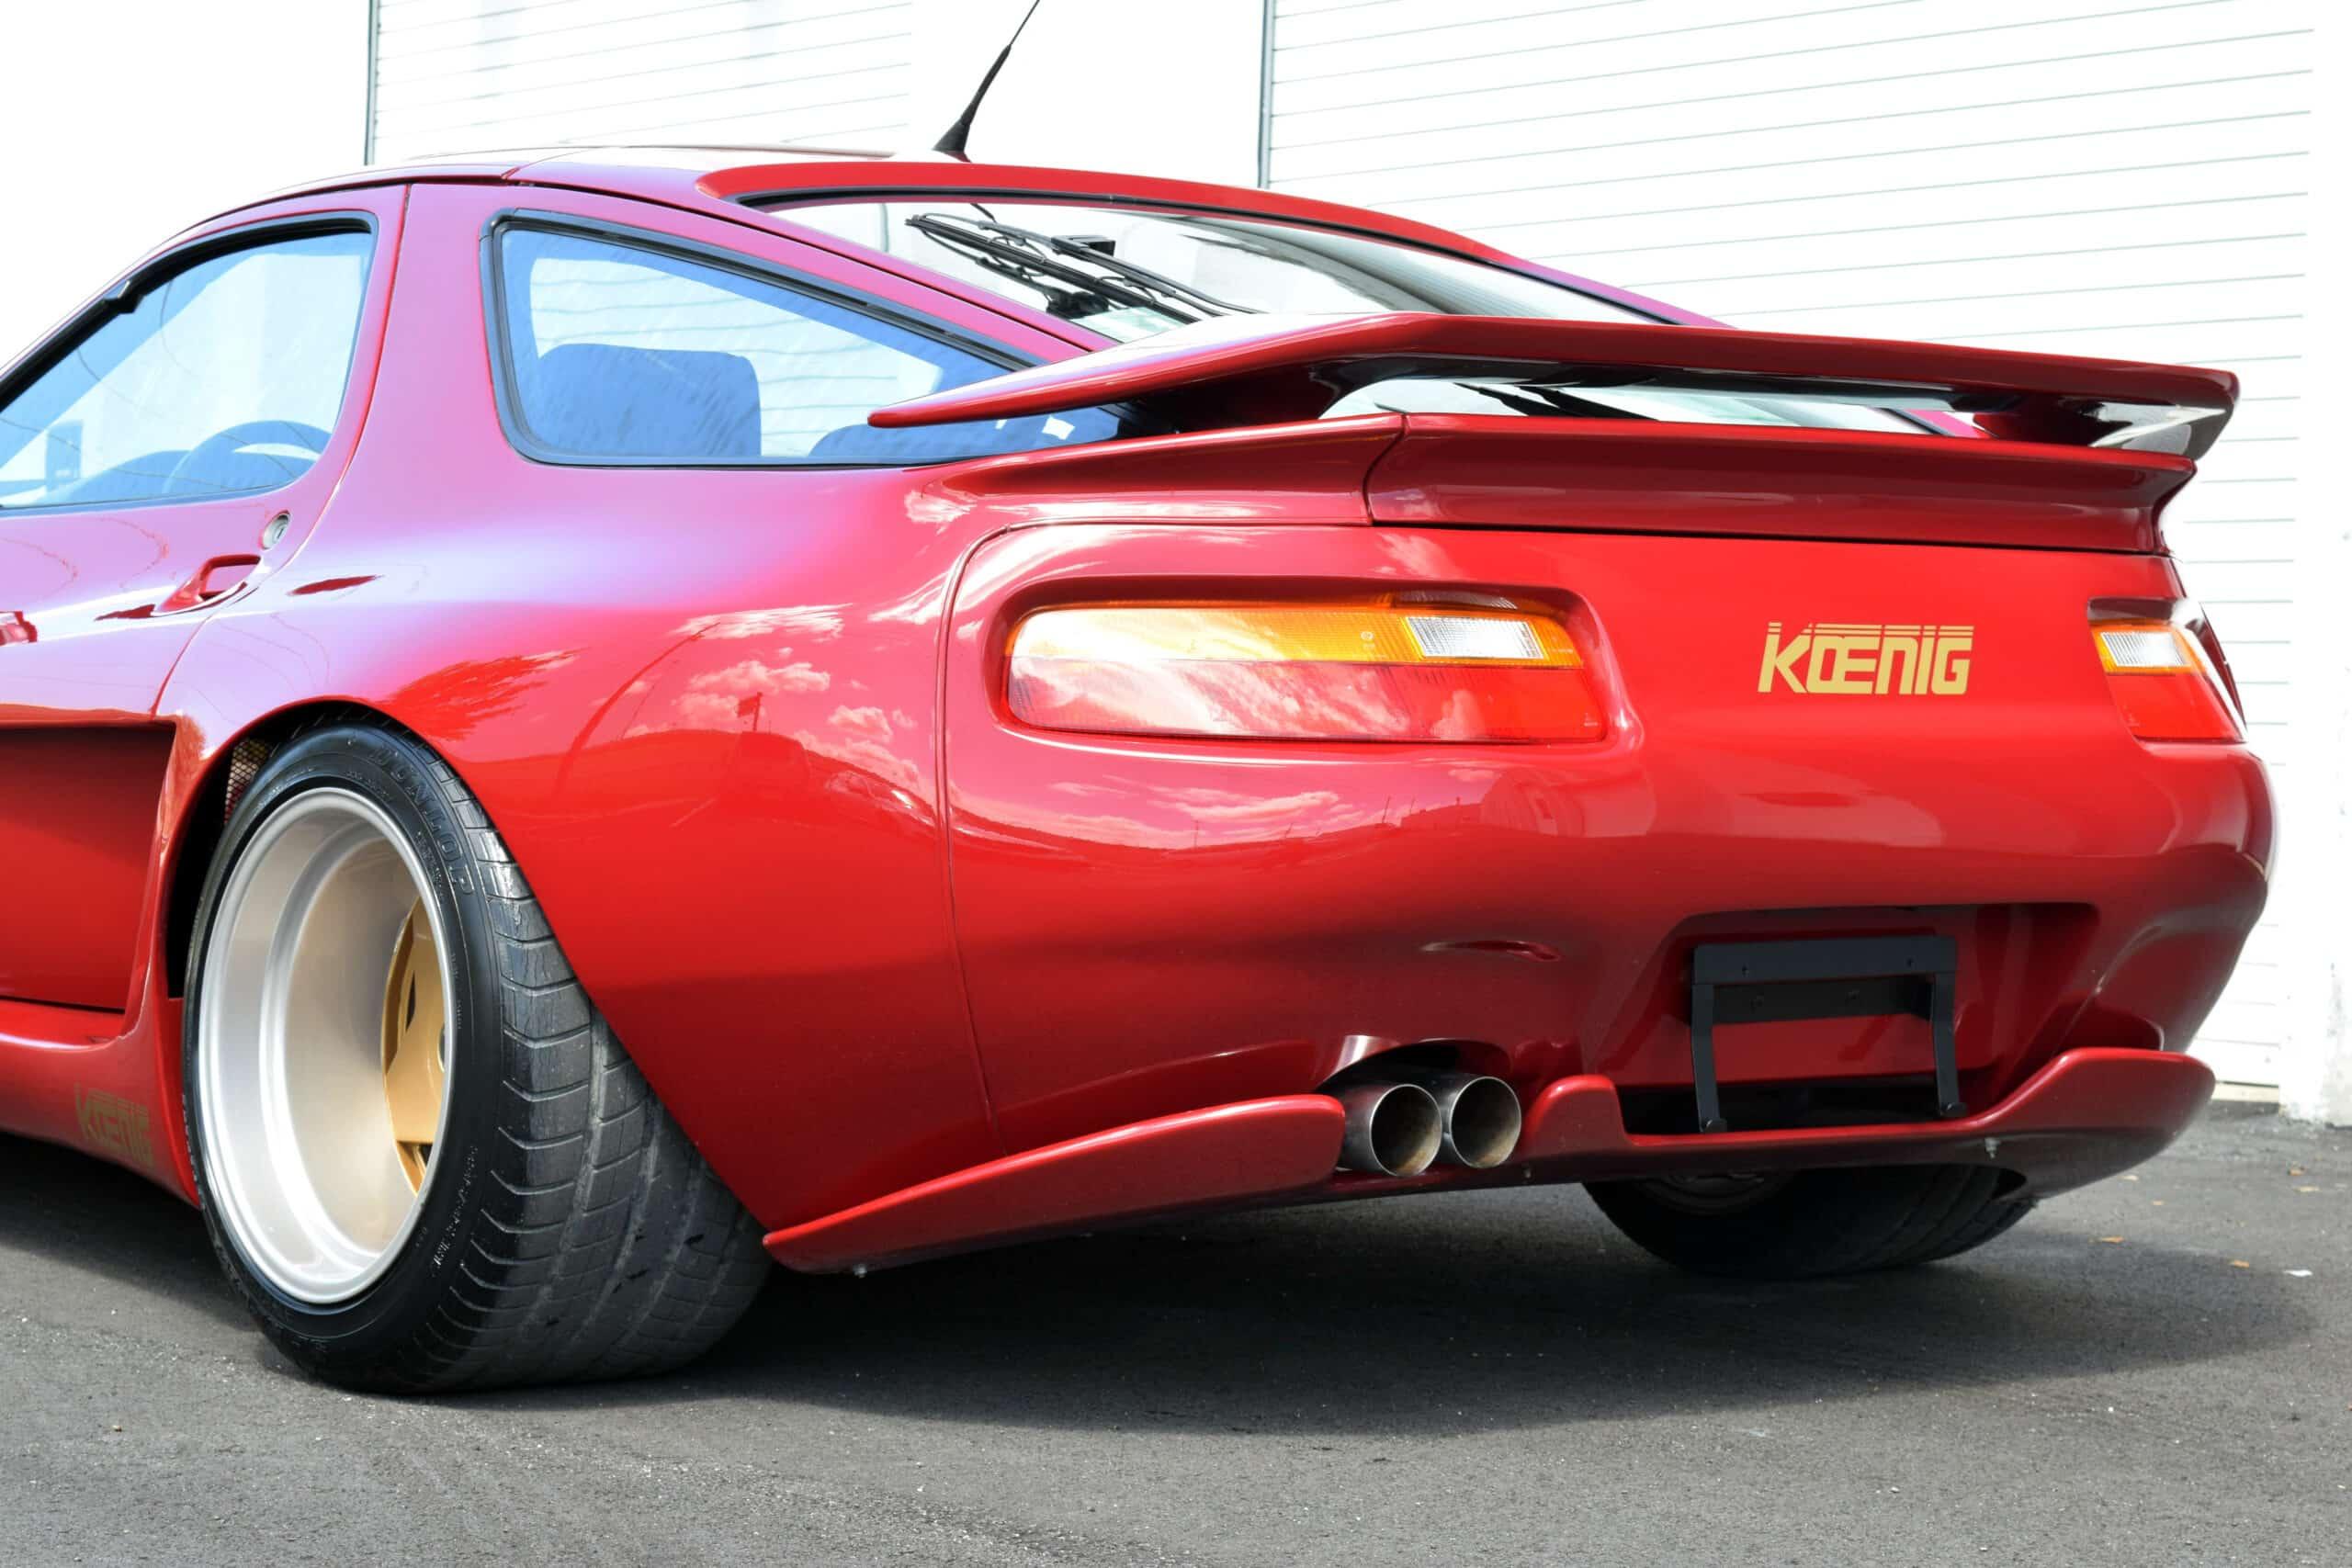 Authentic Koenig Specials Porsche 928, one of a handful ever made, Borbert A wheels, true time machine